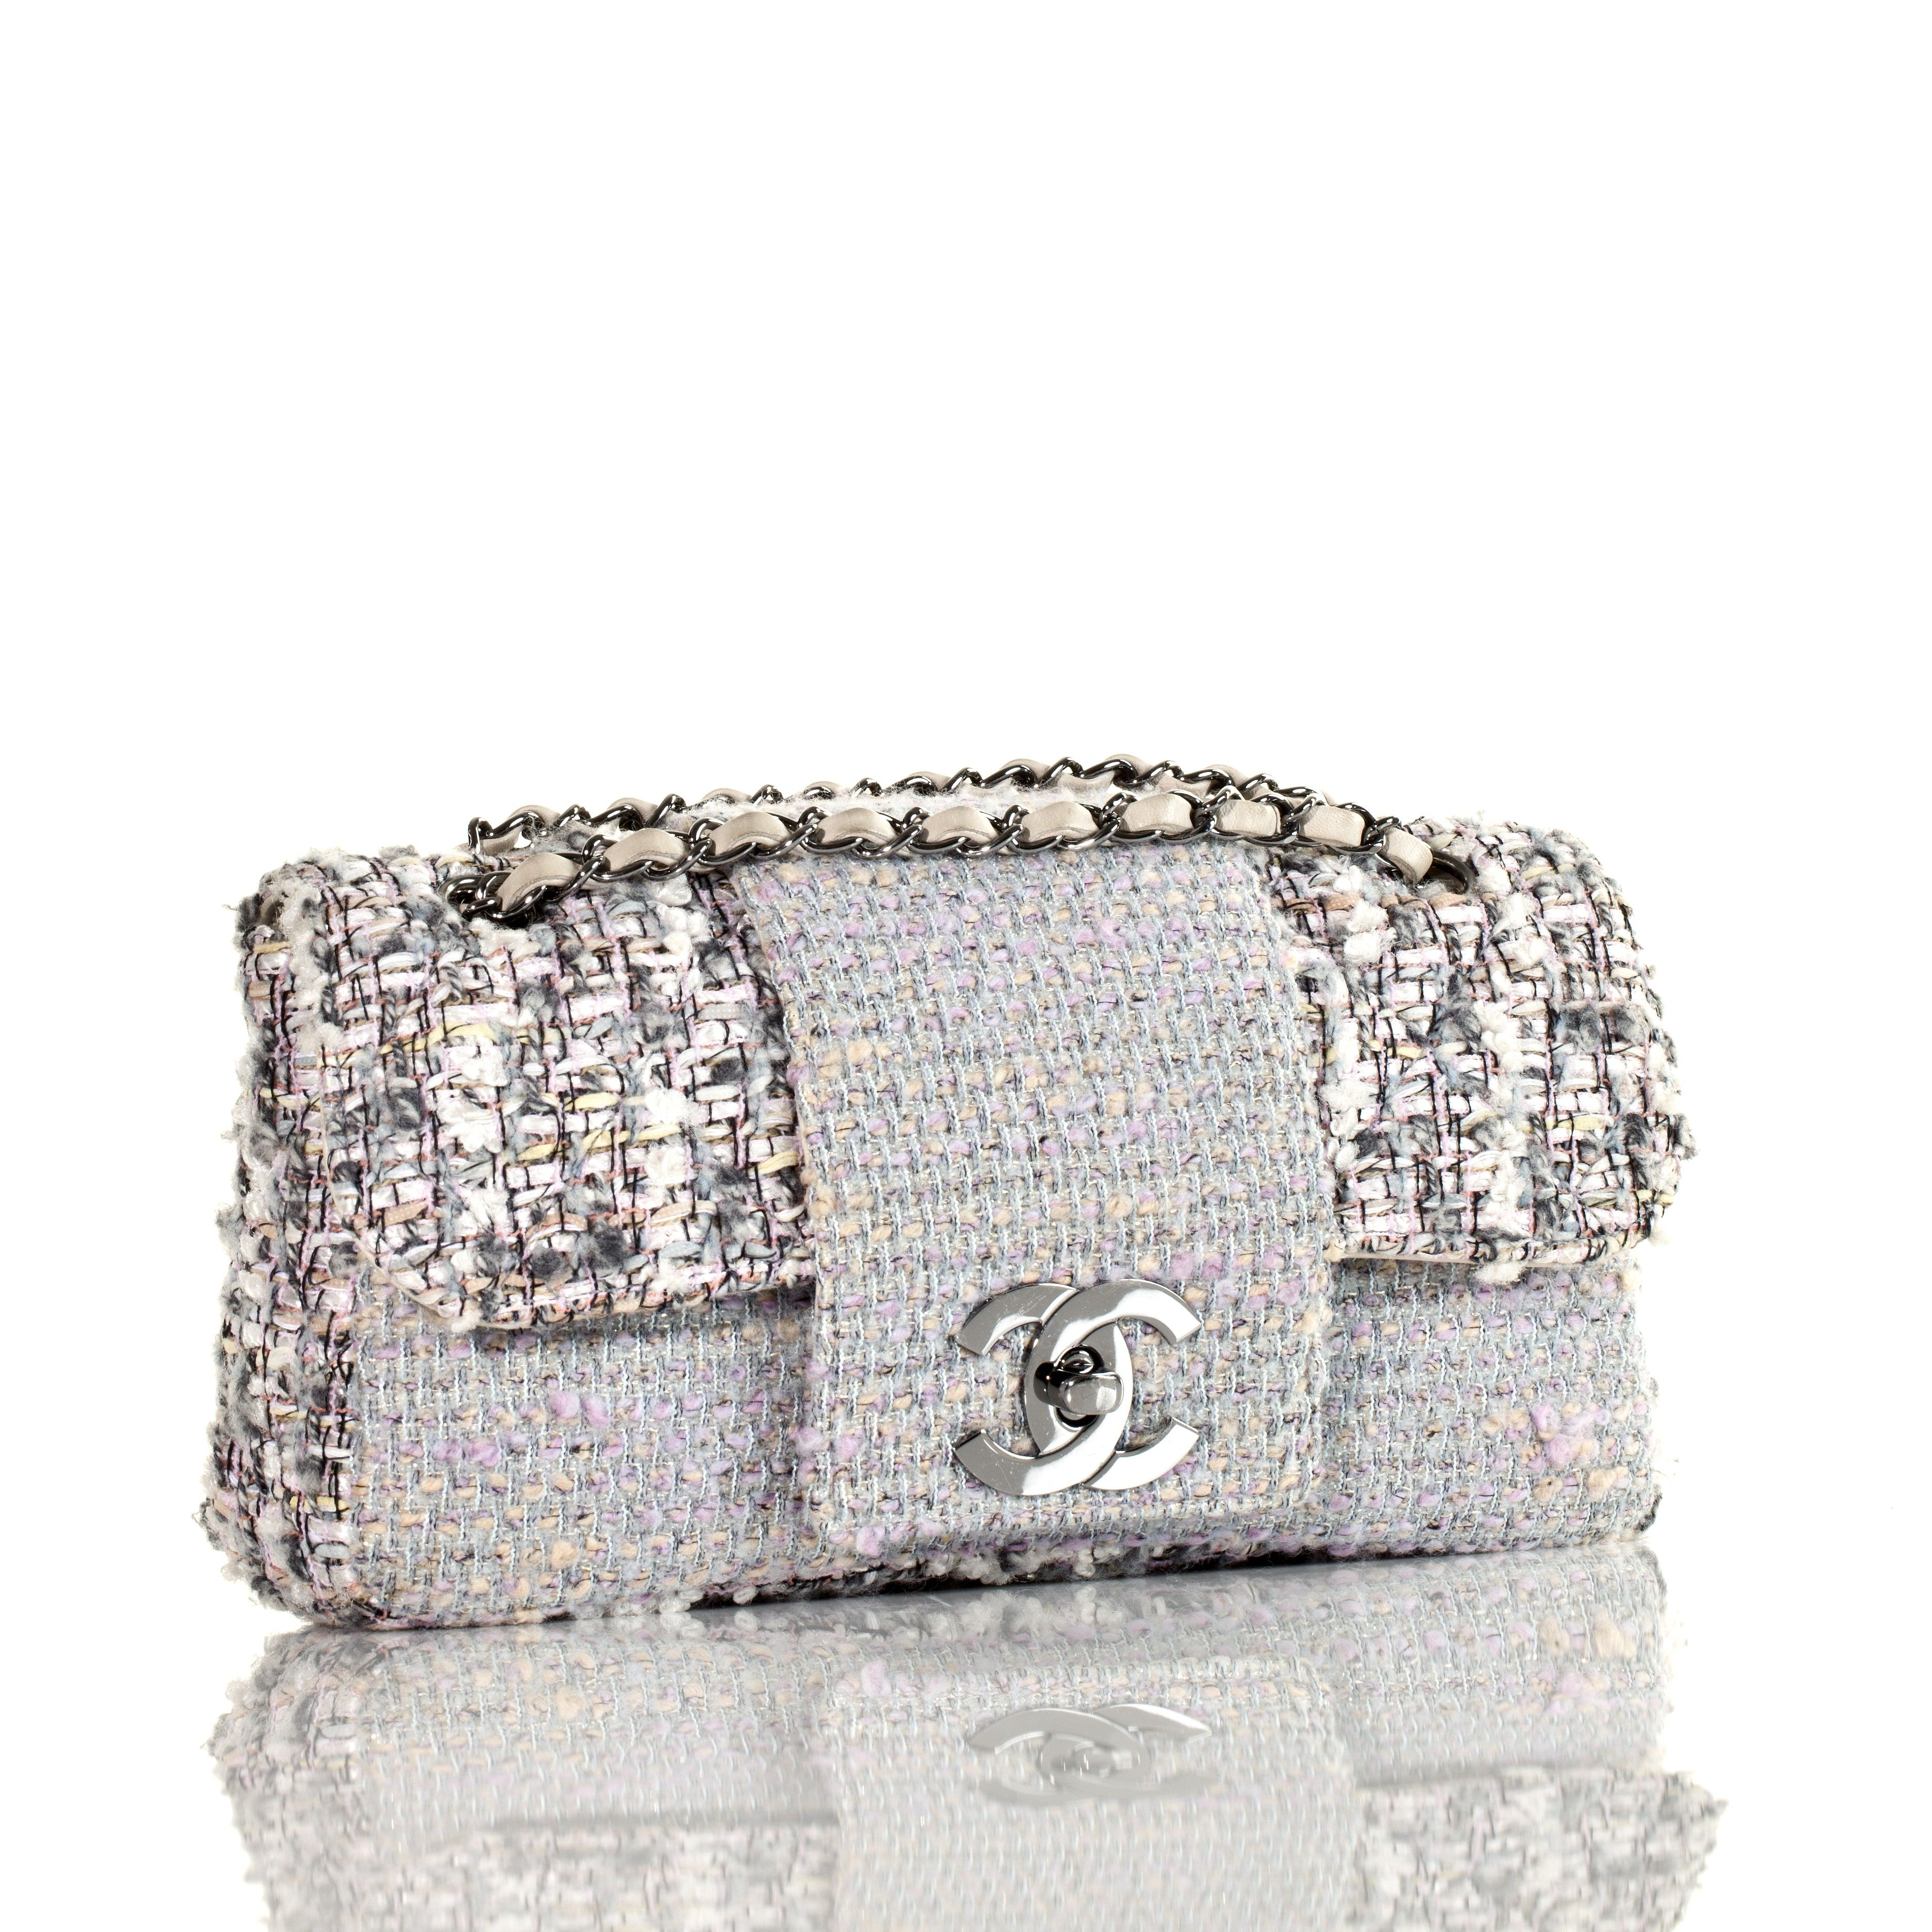 4c7069a10916 Chanel Tweed Classic Fantasy Flap Bag Rare